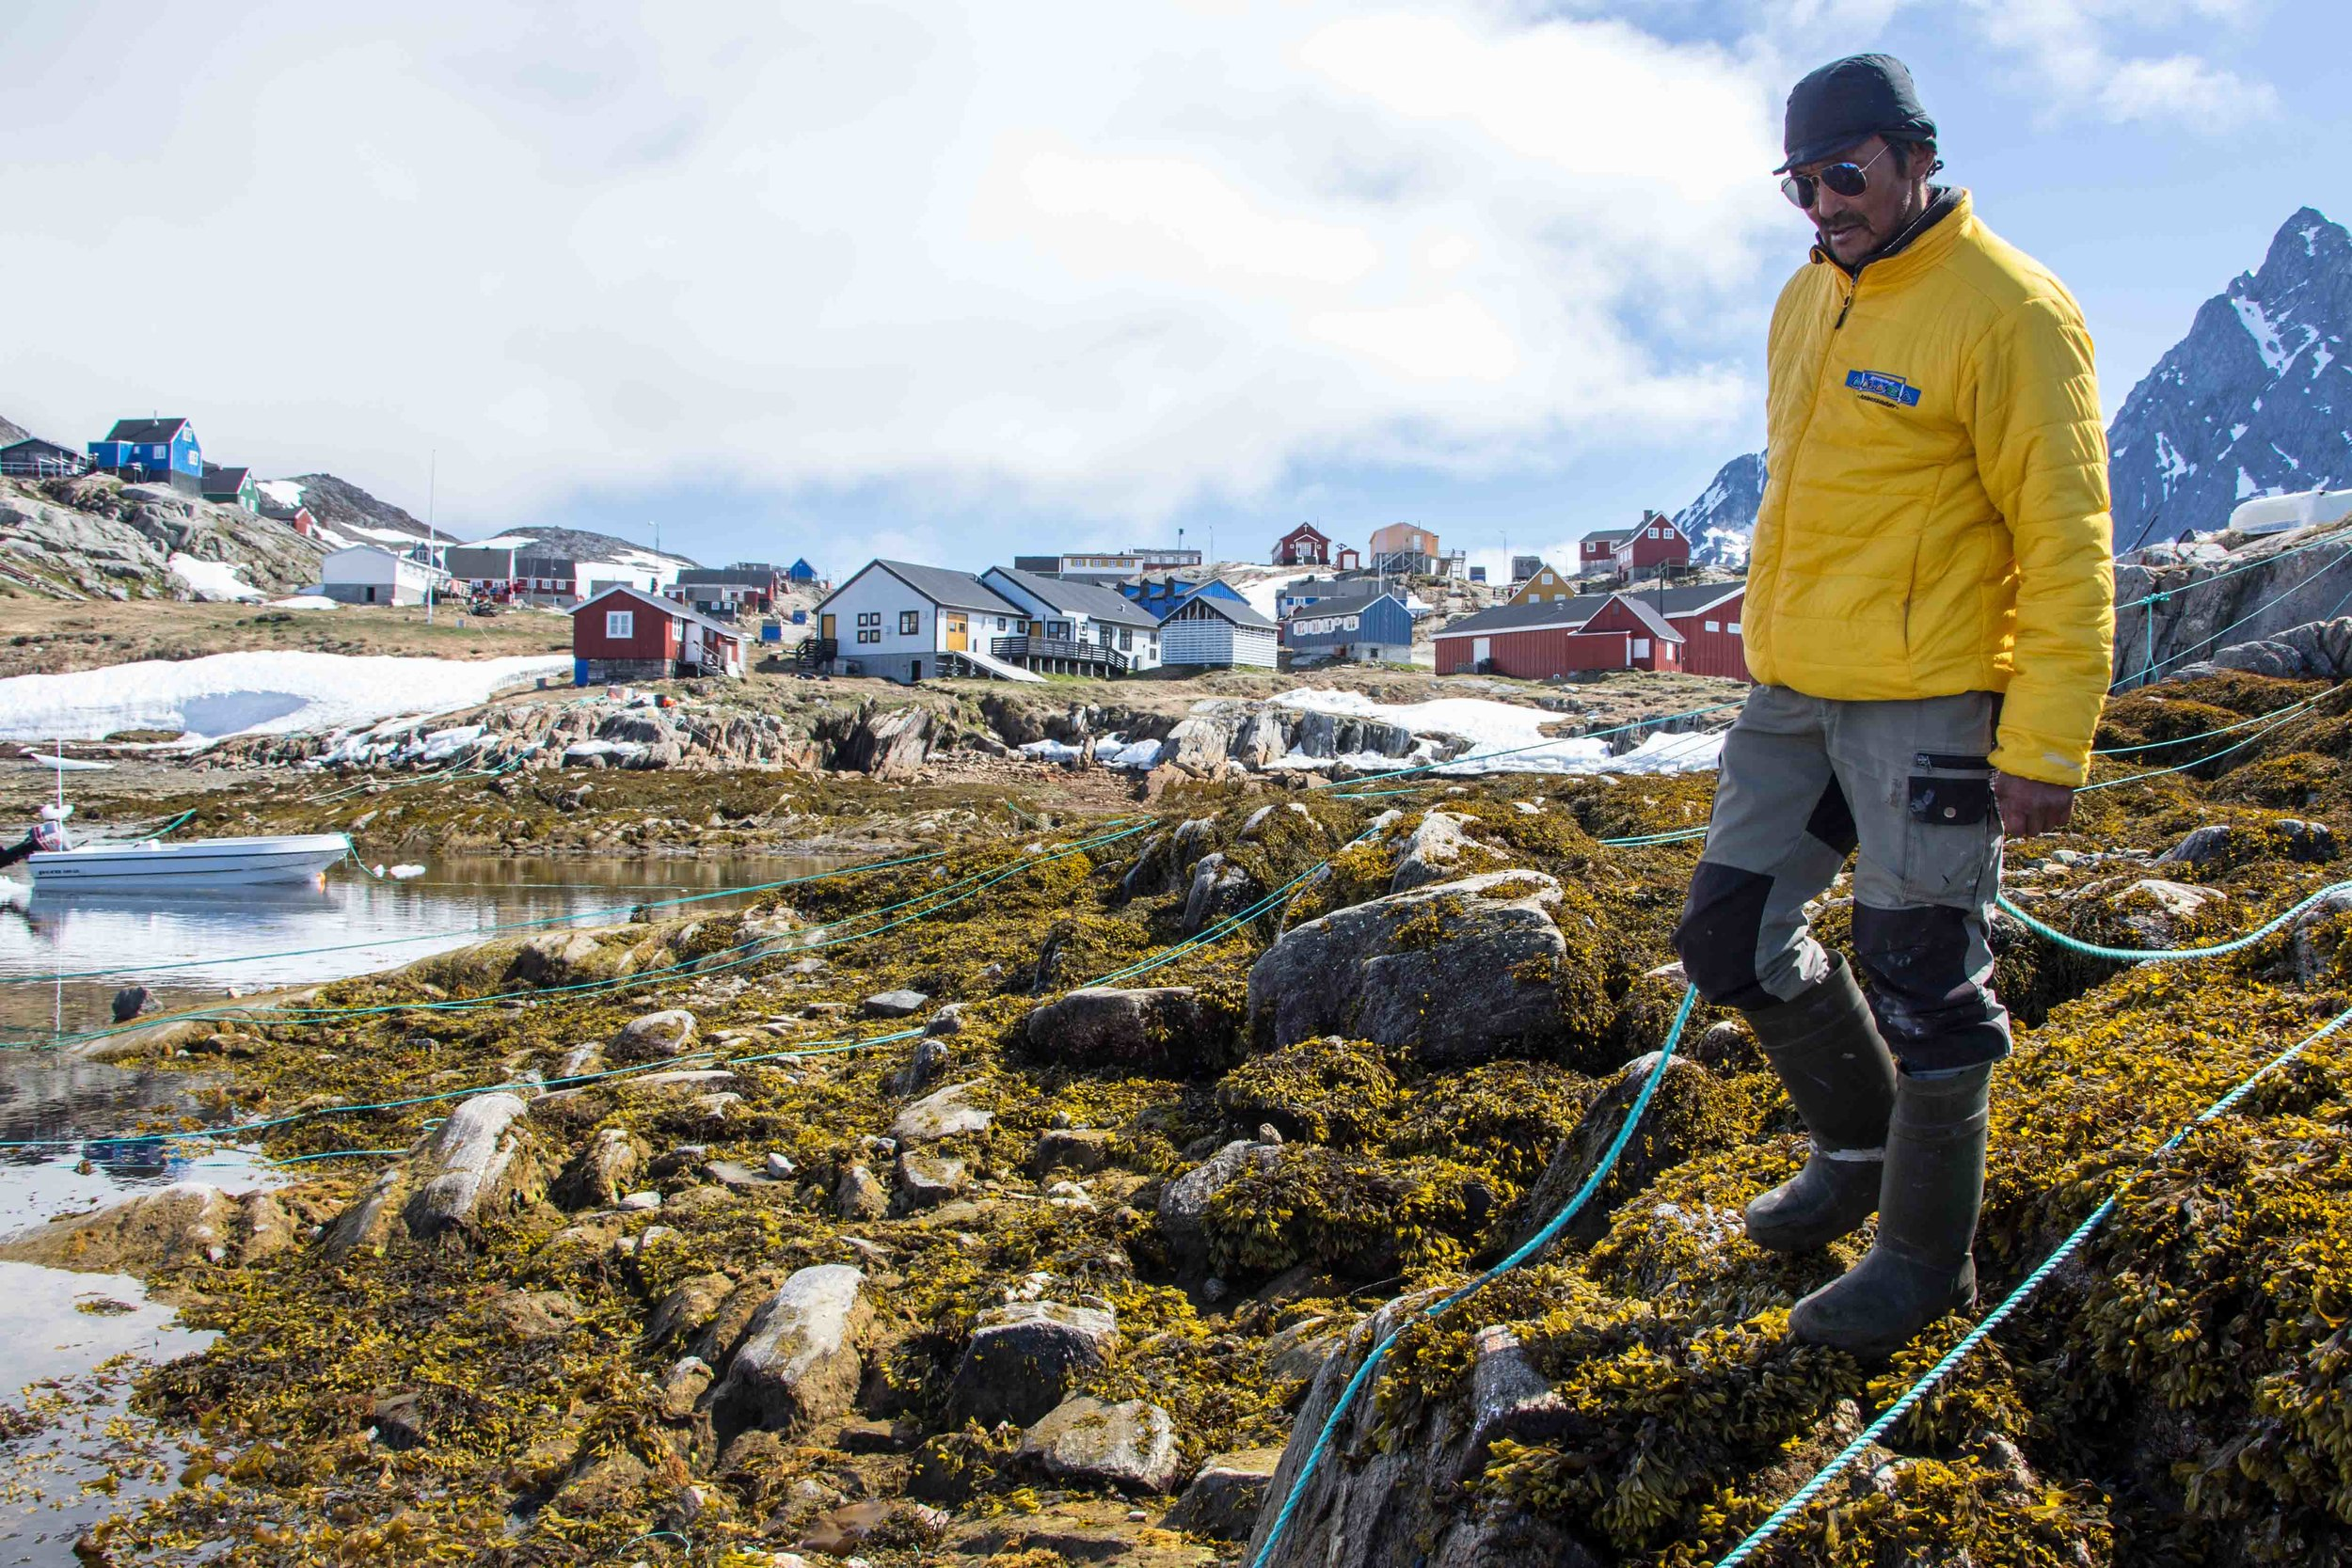 A local fisherman returns to the harbour in Kuummiit, Eat Greenland. Photo: Matt Reichel.